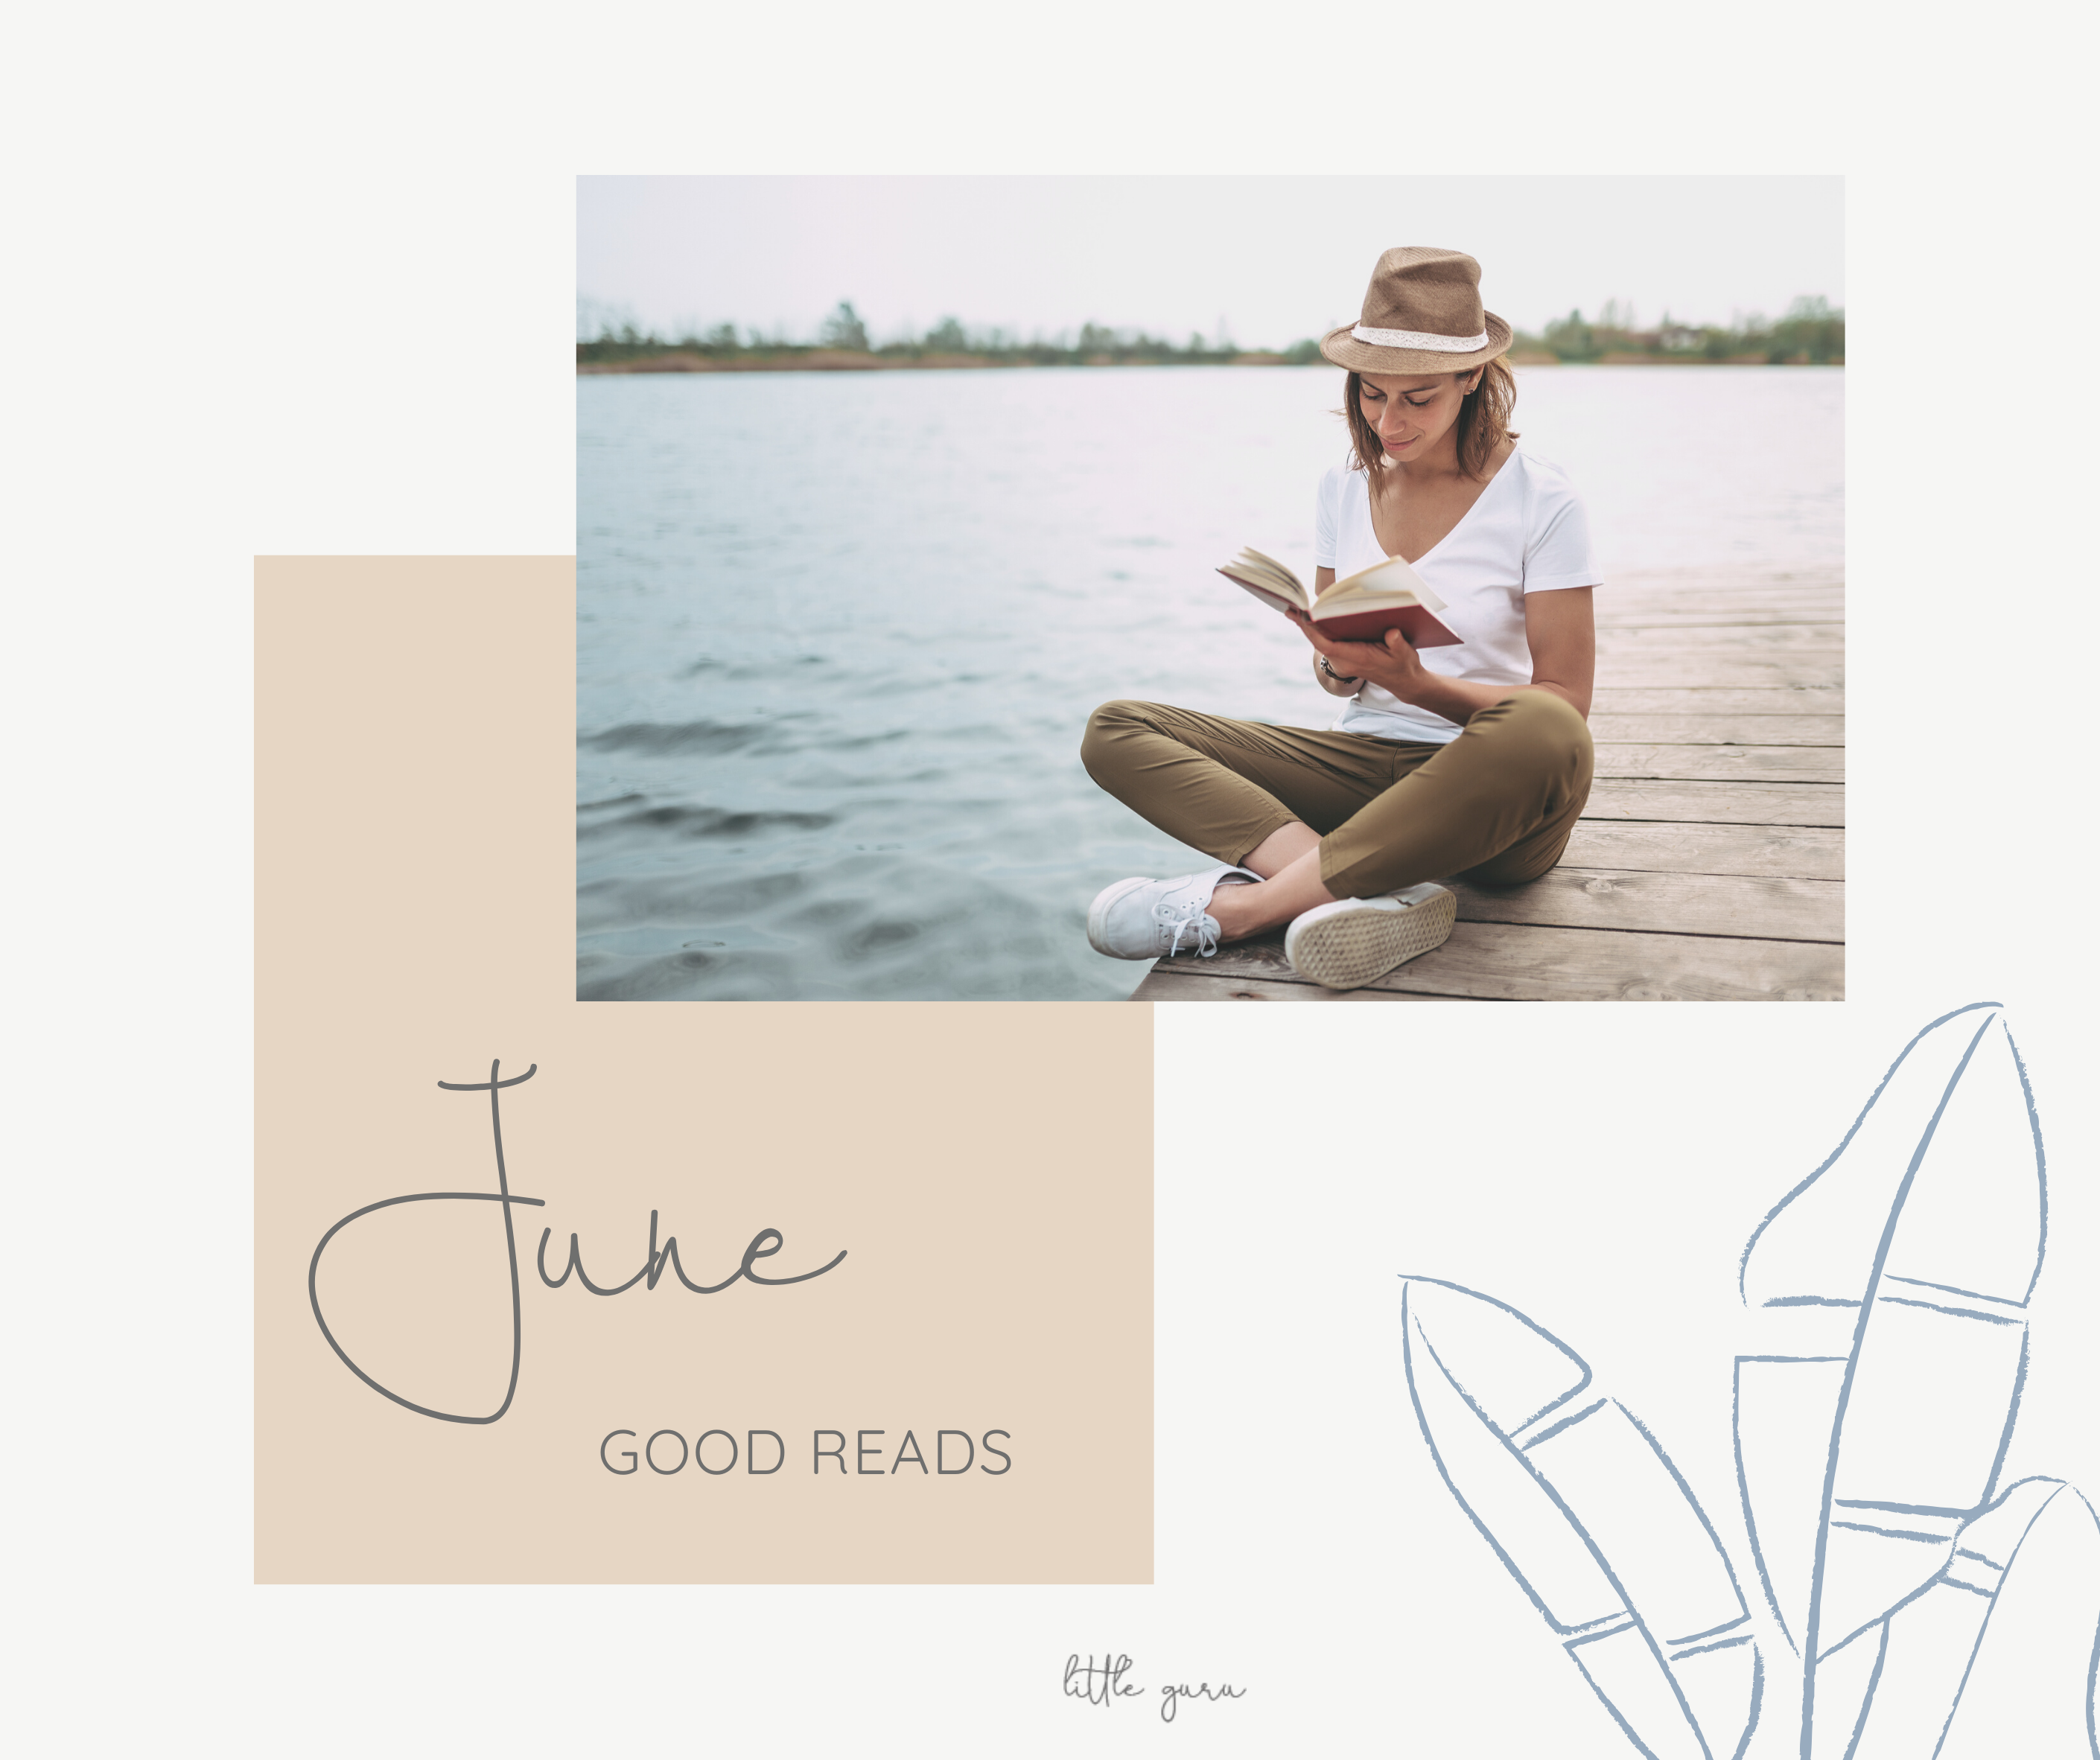 June Good Reads